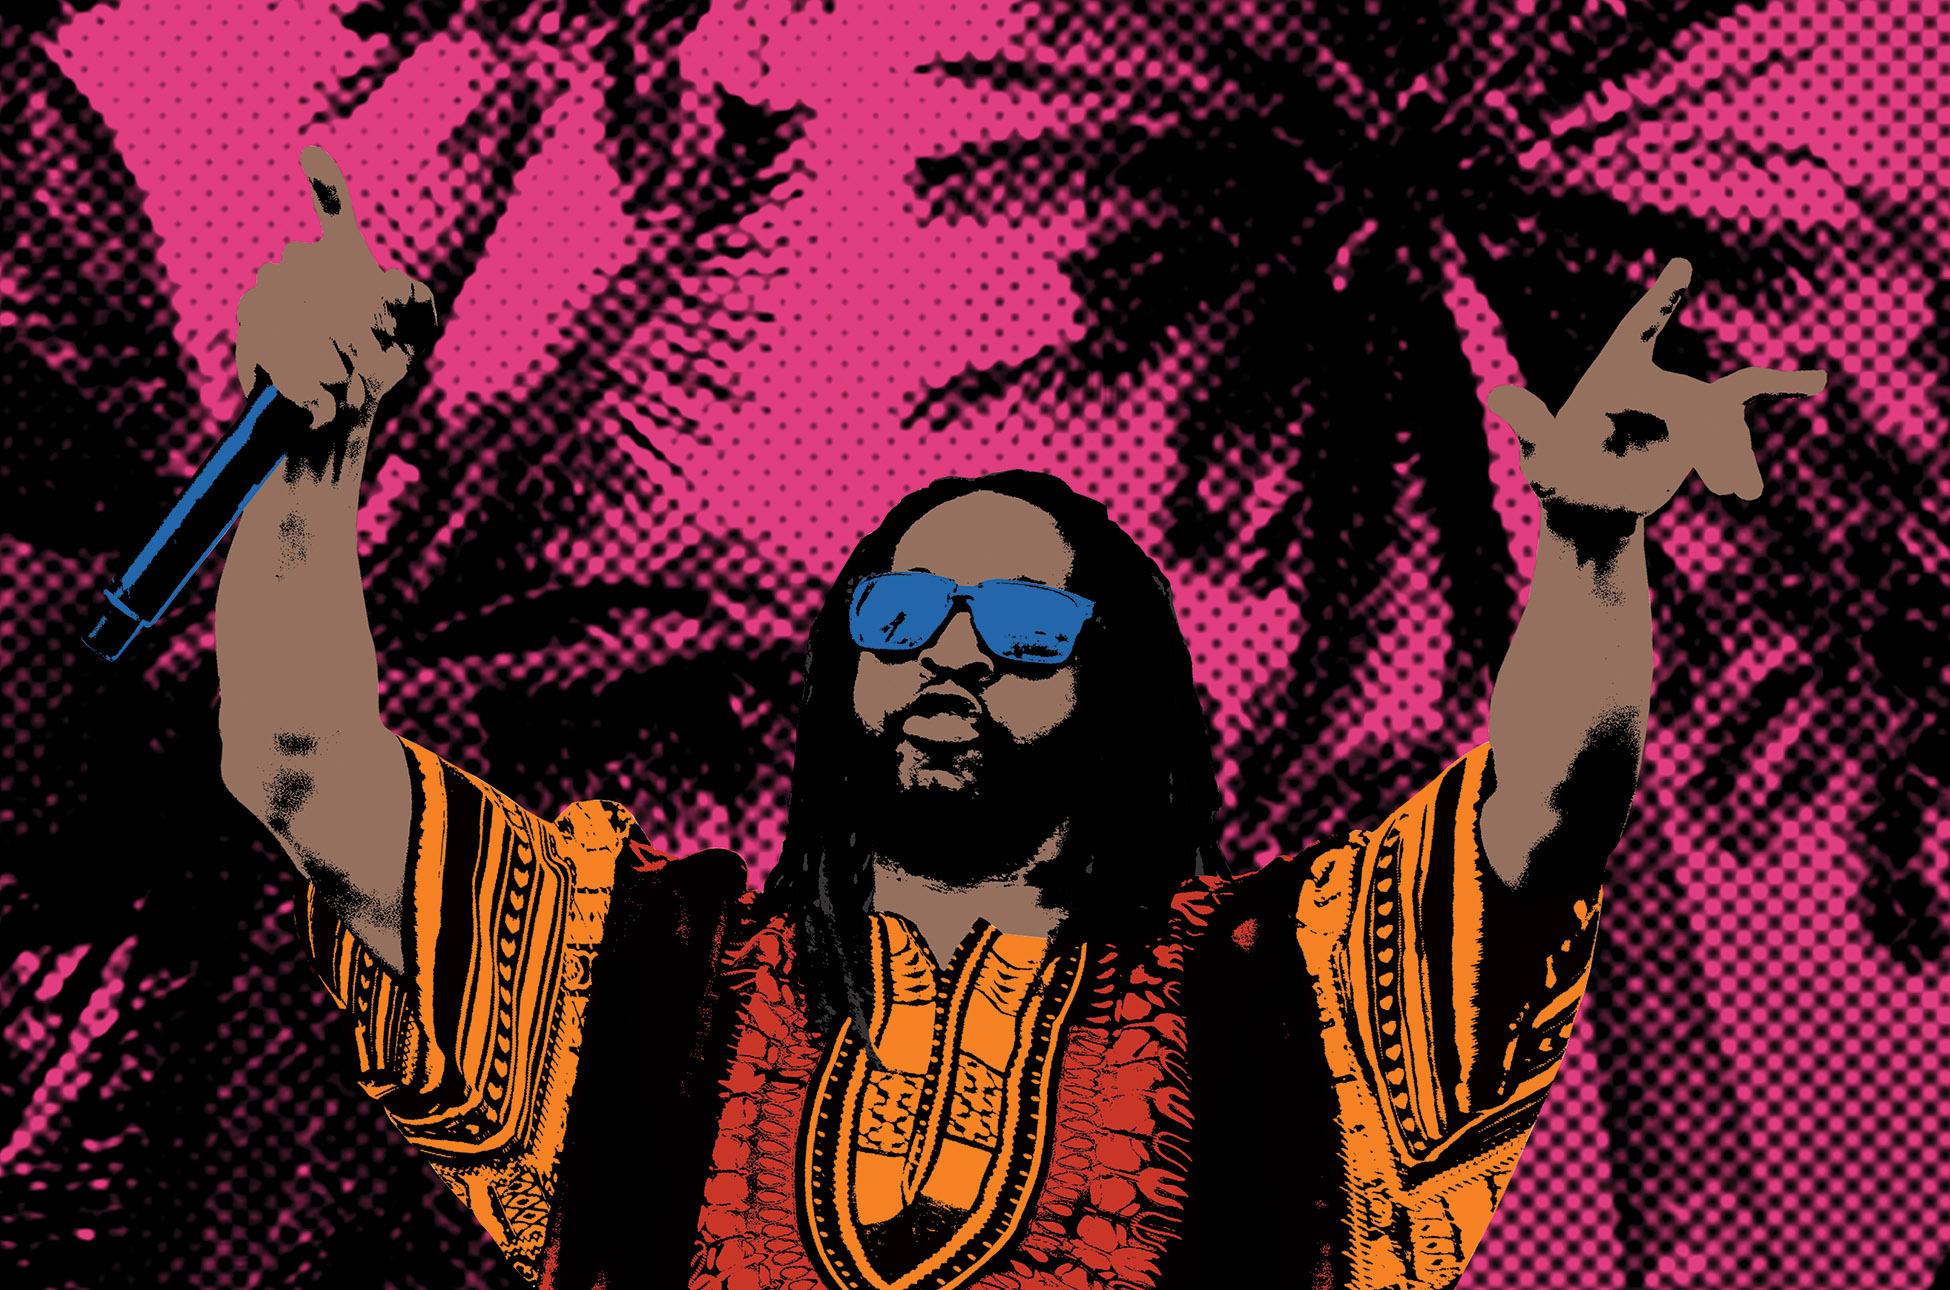 Lil Jon Hd